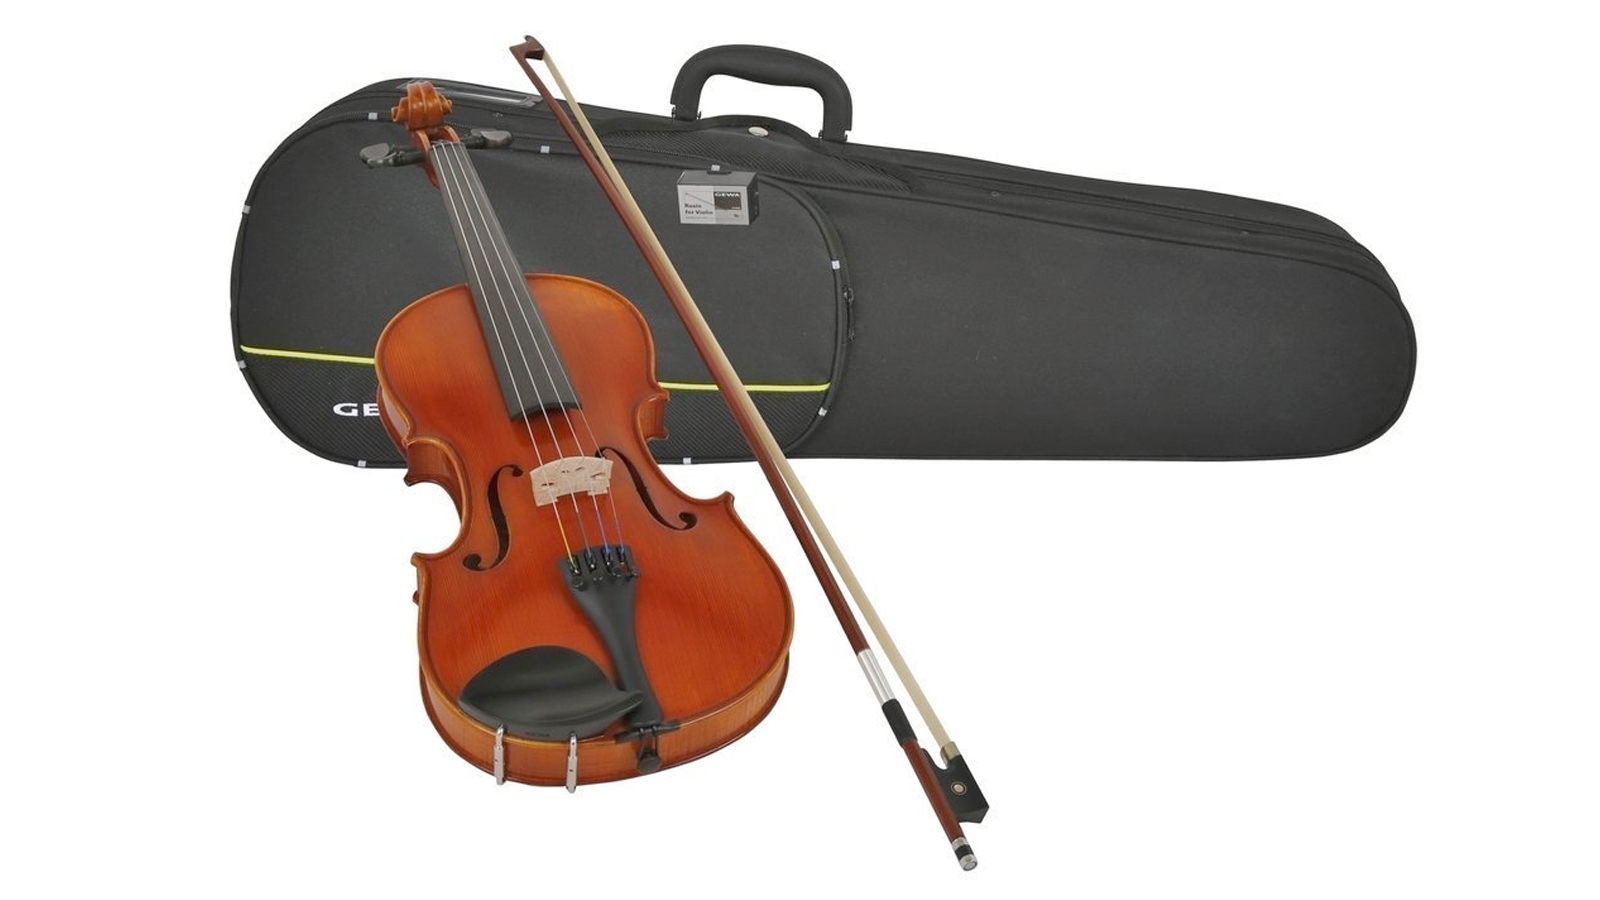 Gewa Aspirante Violingarnitur Marseille 1/2